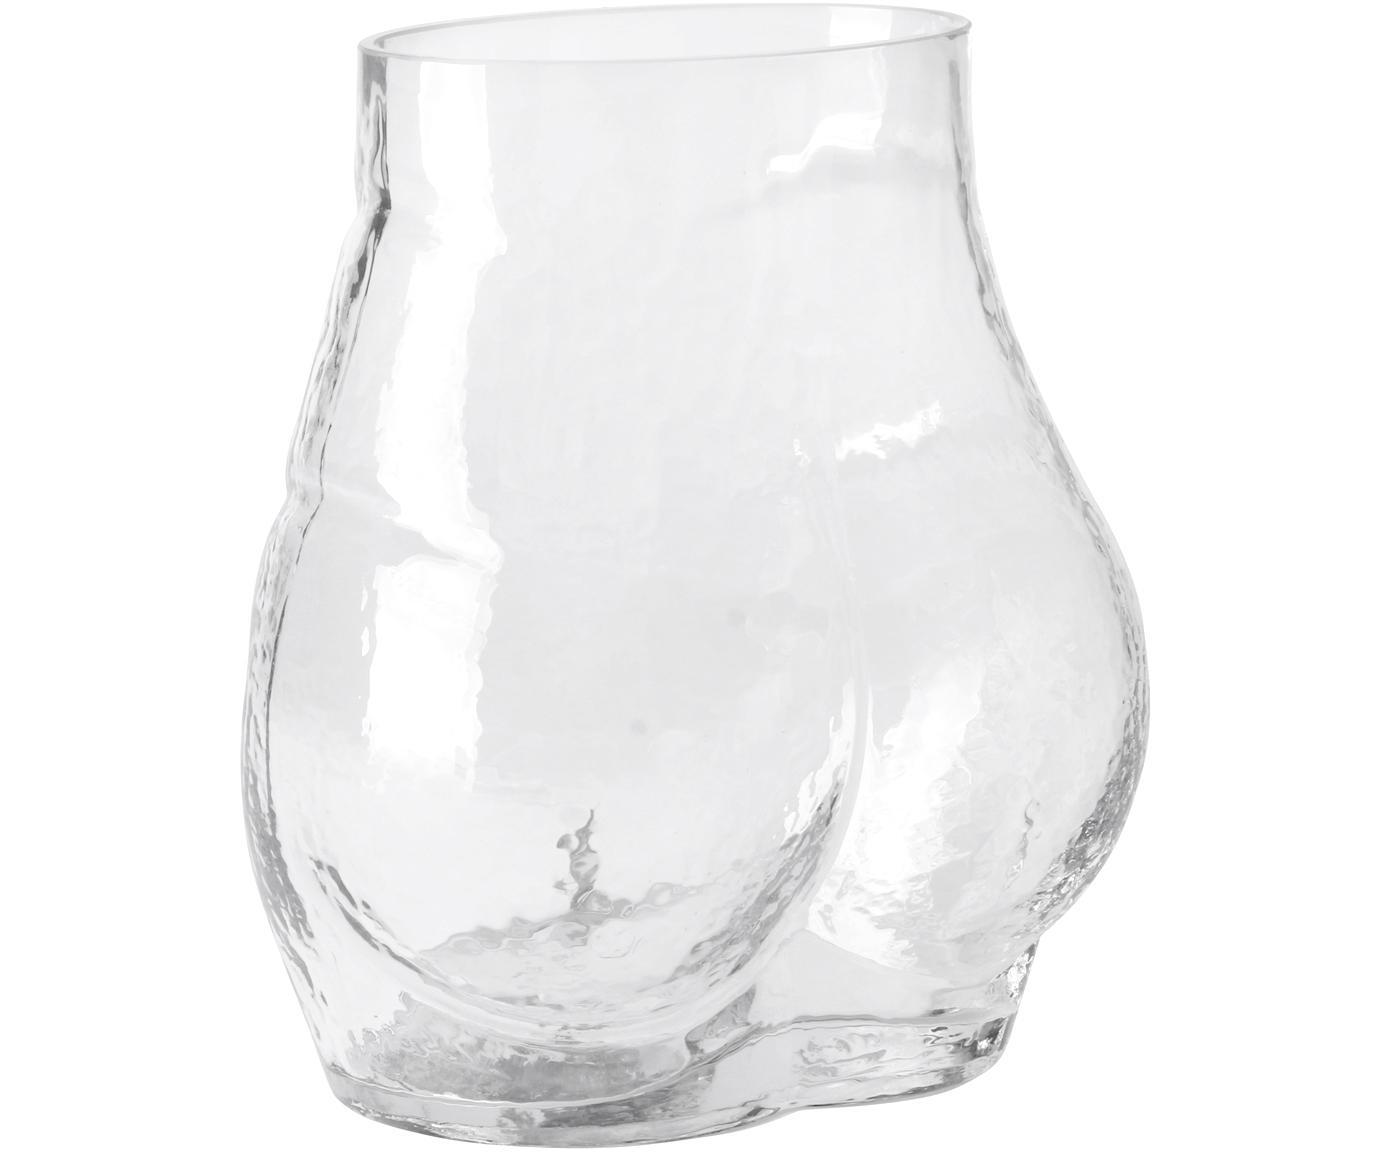 Glazen vaas Peach, Glas, Transparant, 20 x 23 cm